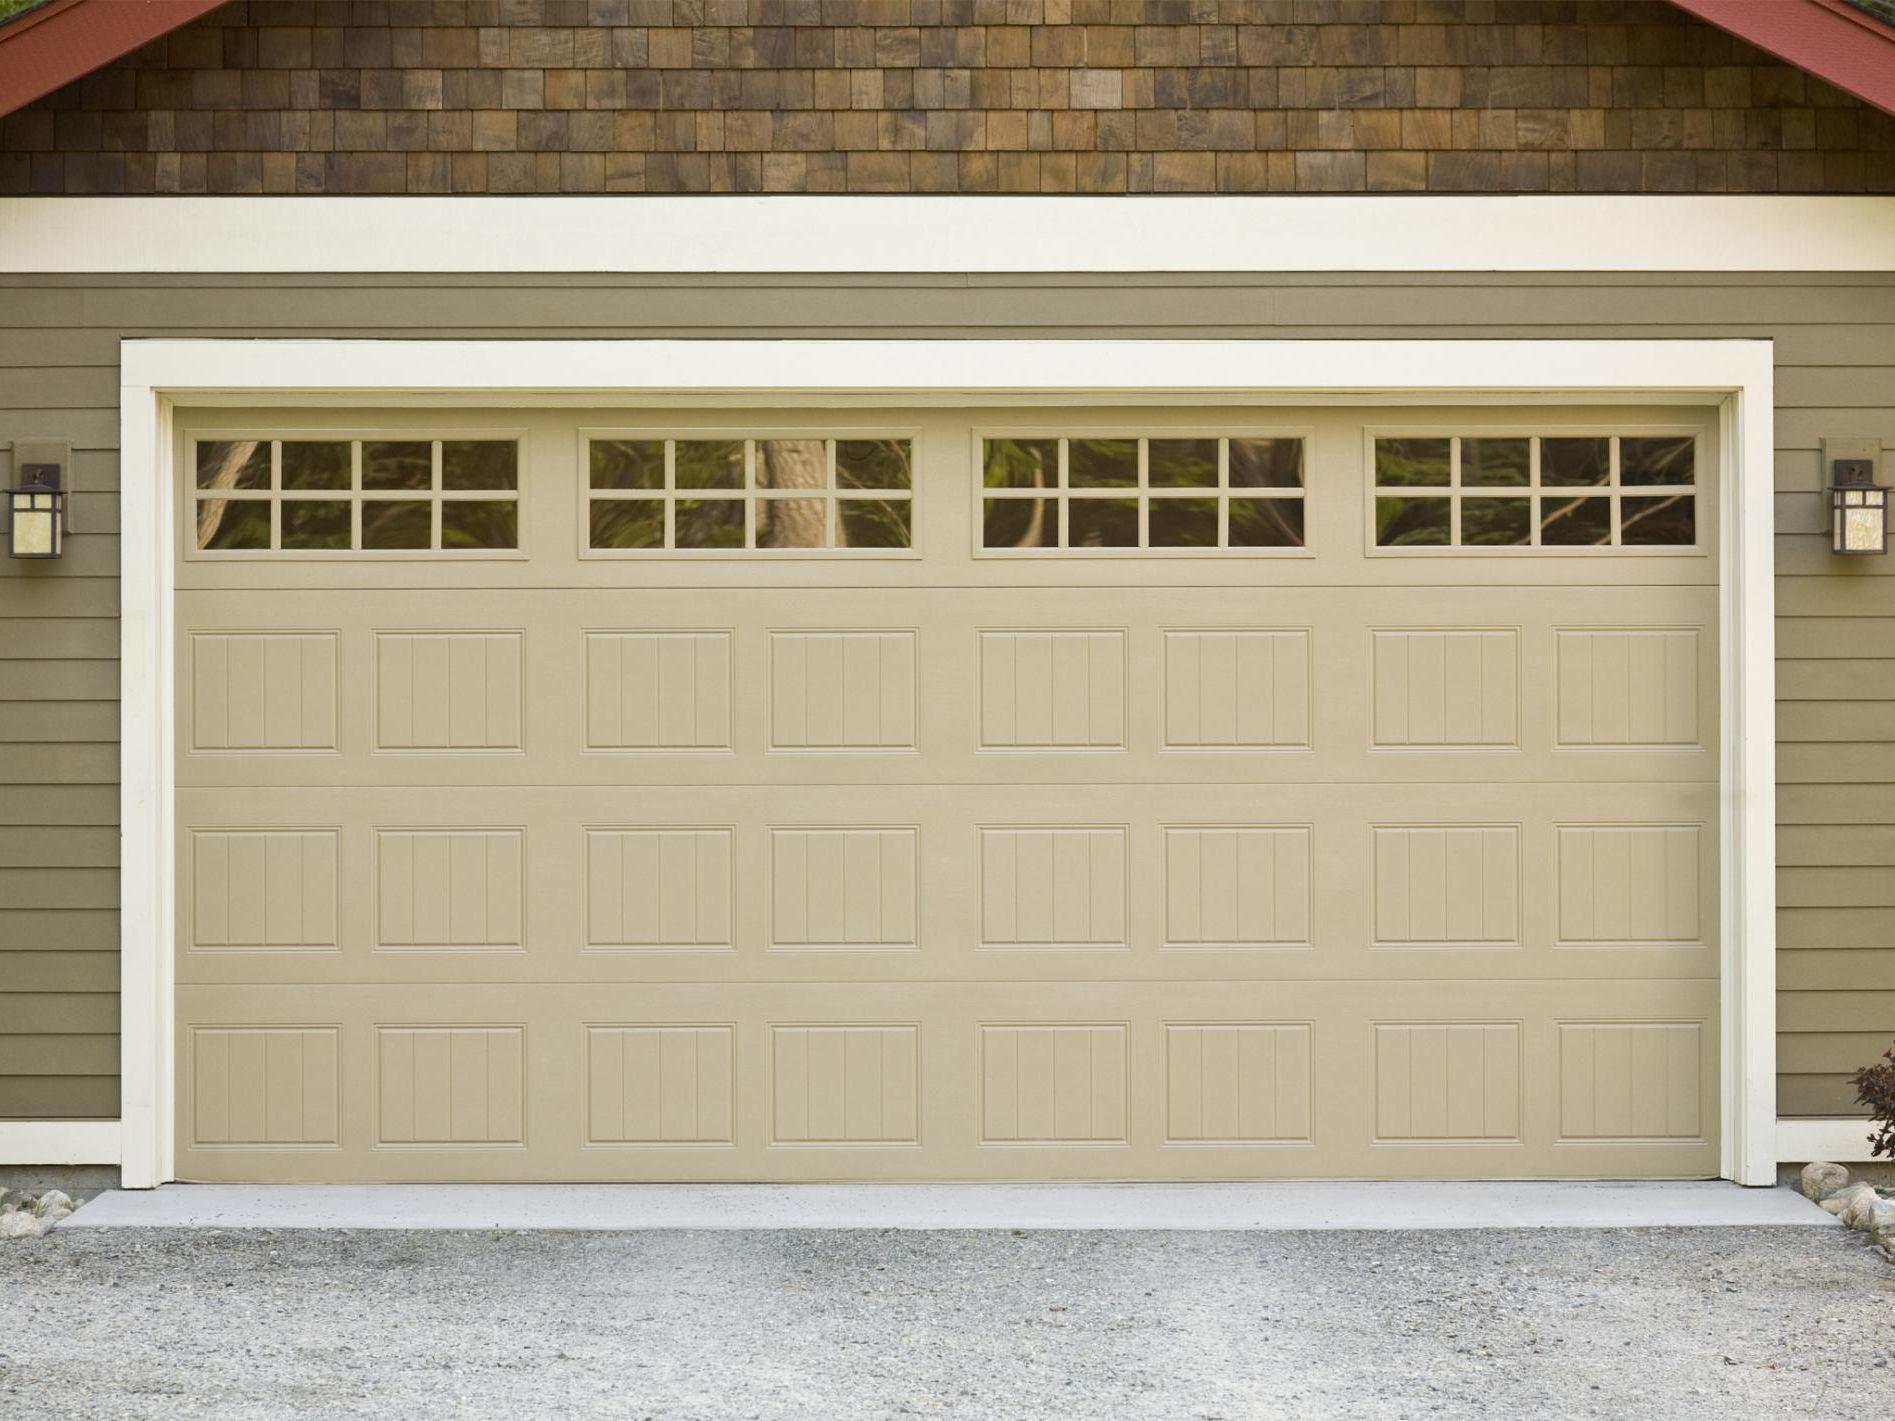 Garage Floors With Plywood And Rigid Foam